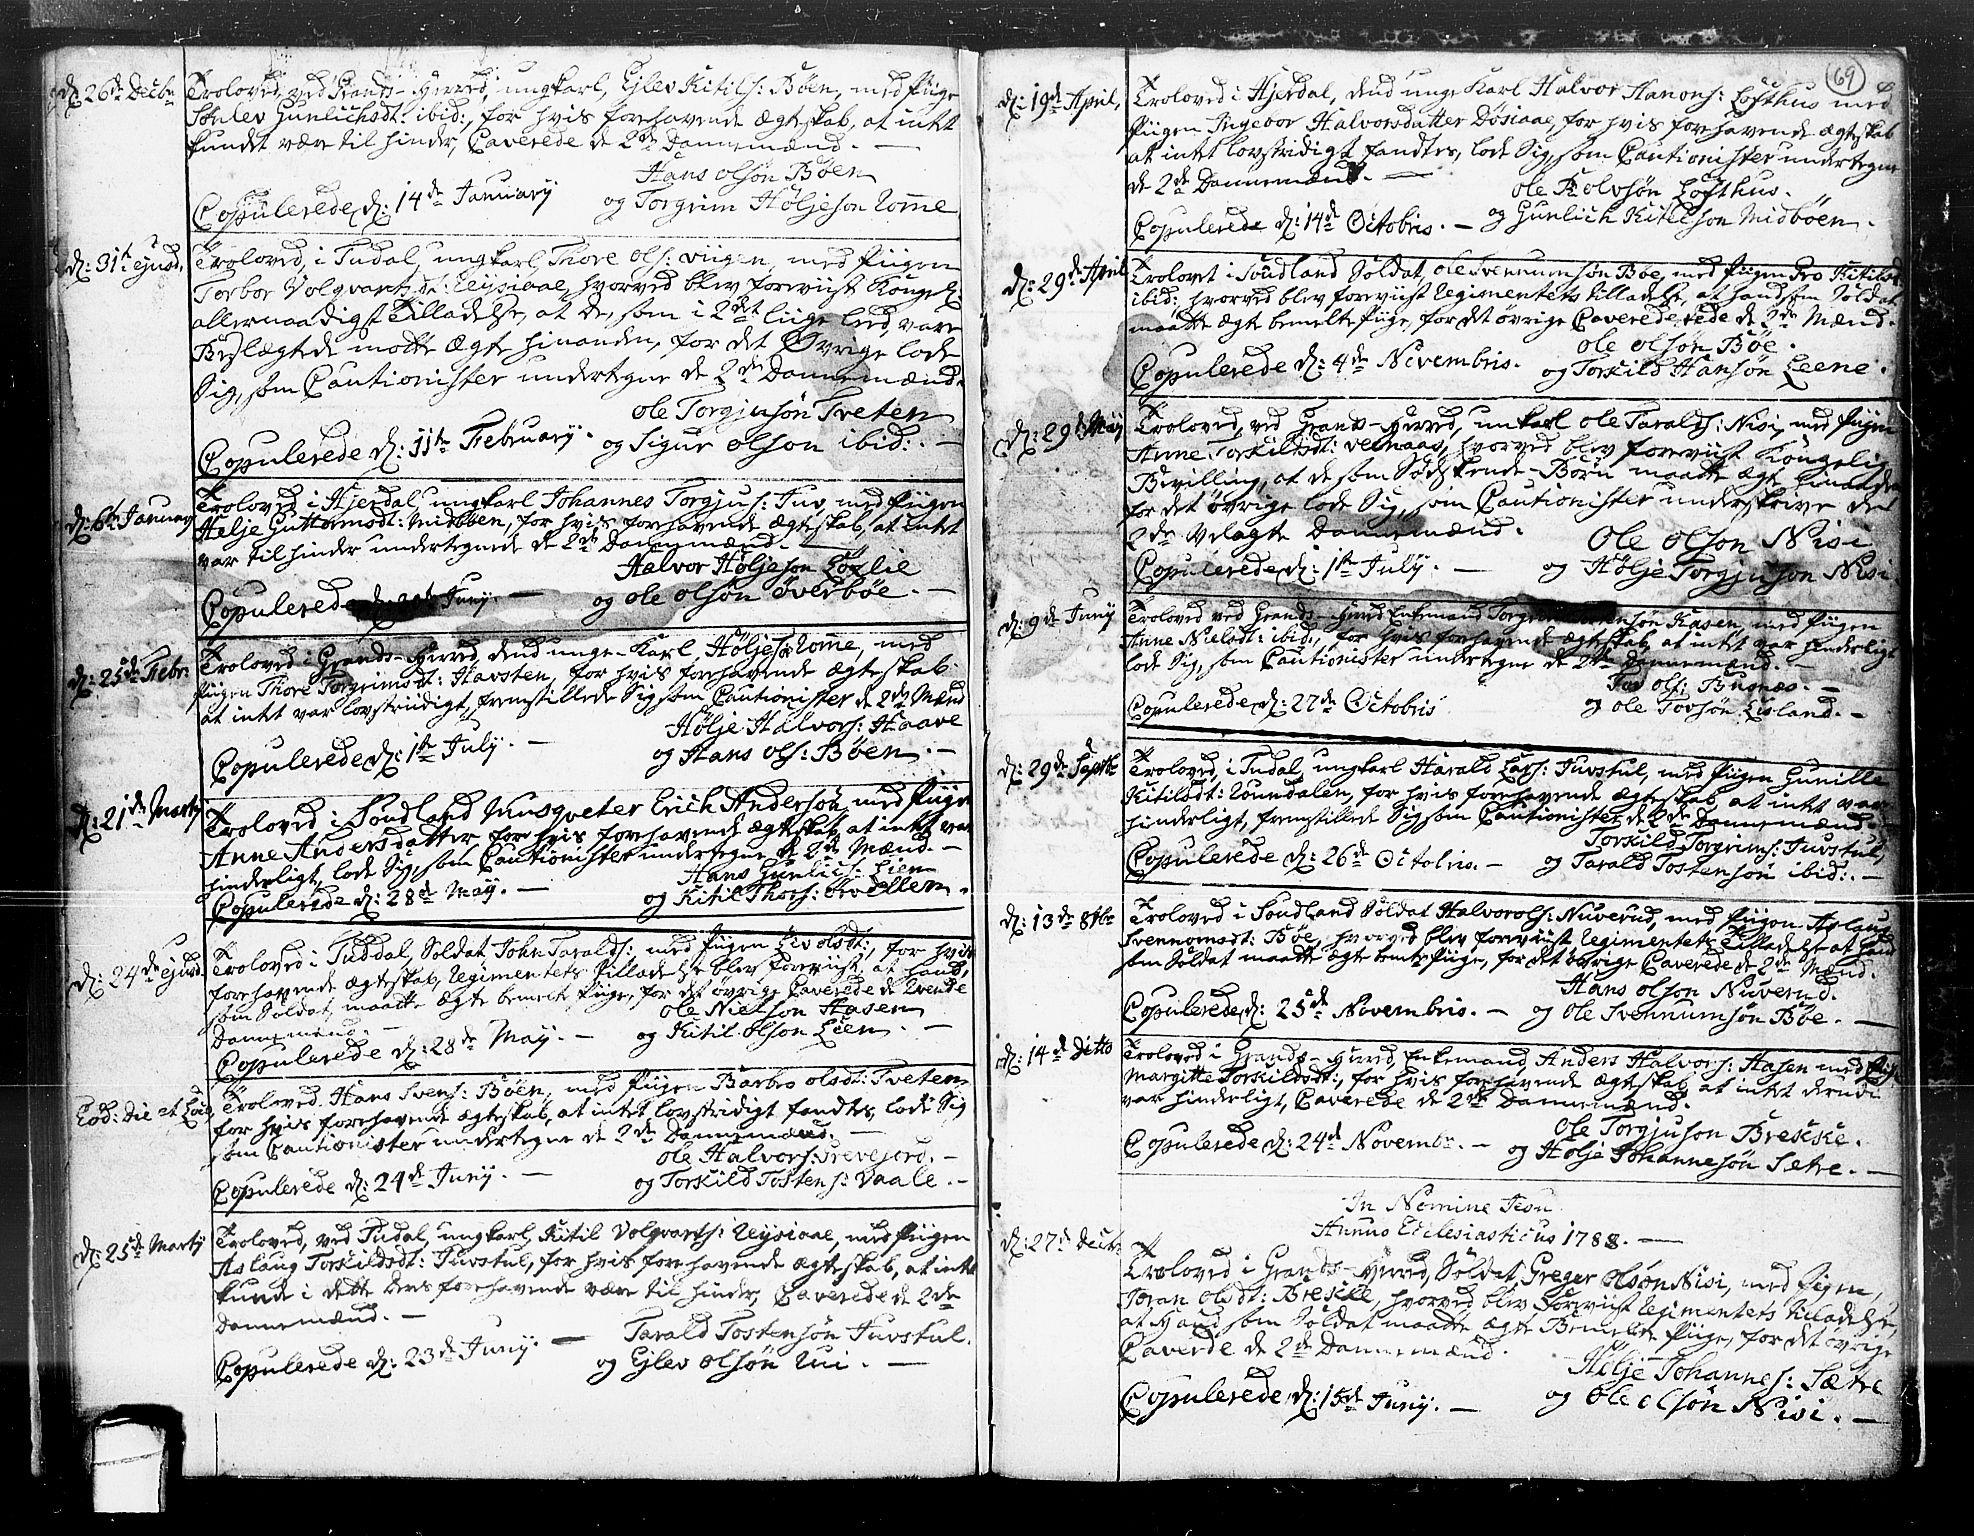 SAKO, Hjartdal kirkebøker, F/Fa/L0004: Ministerialbok nr. I 4, 1727-1795, s. 69